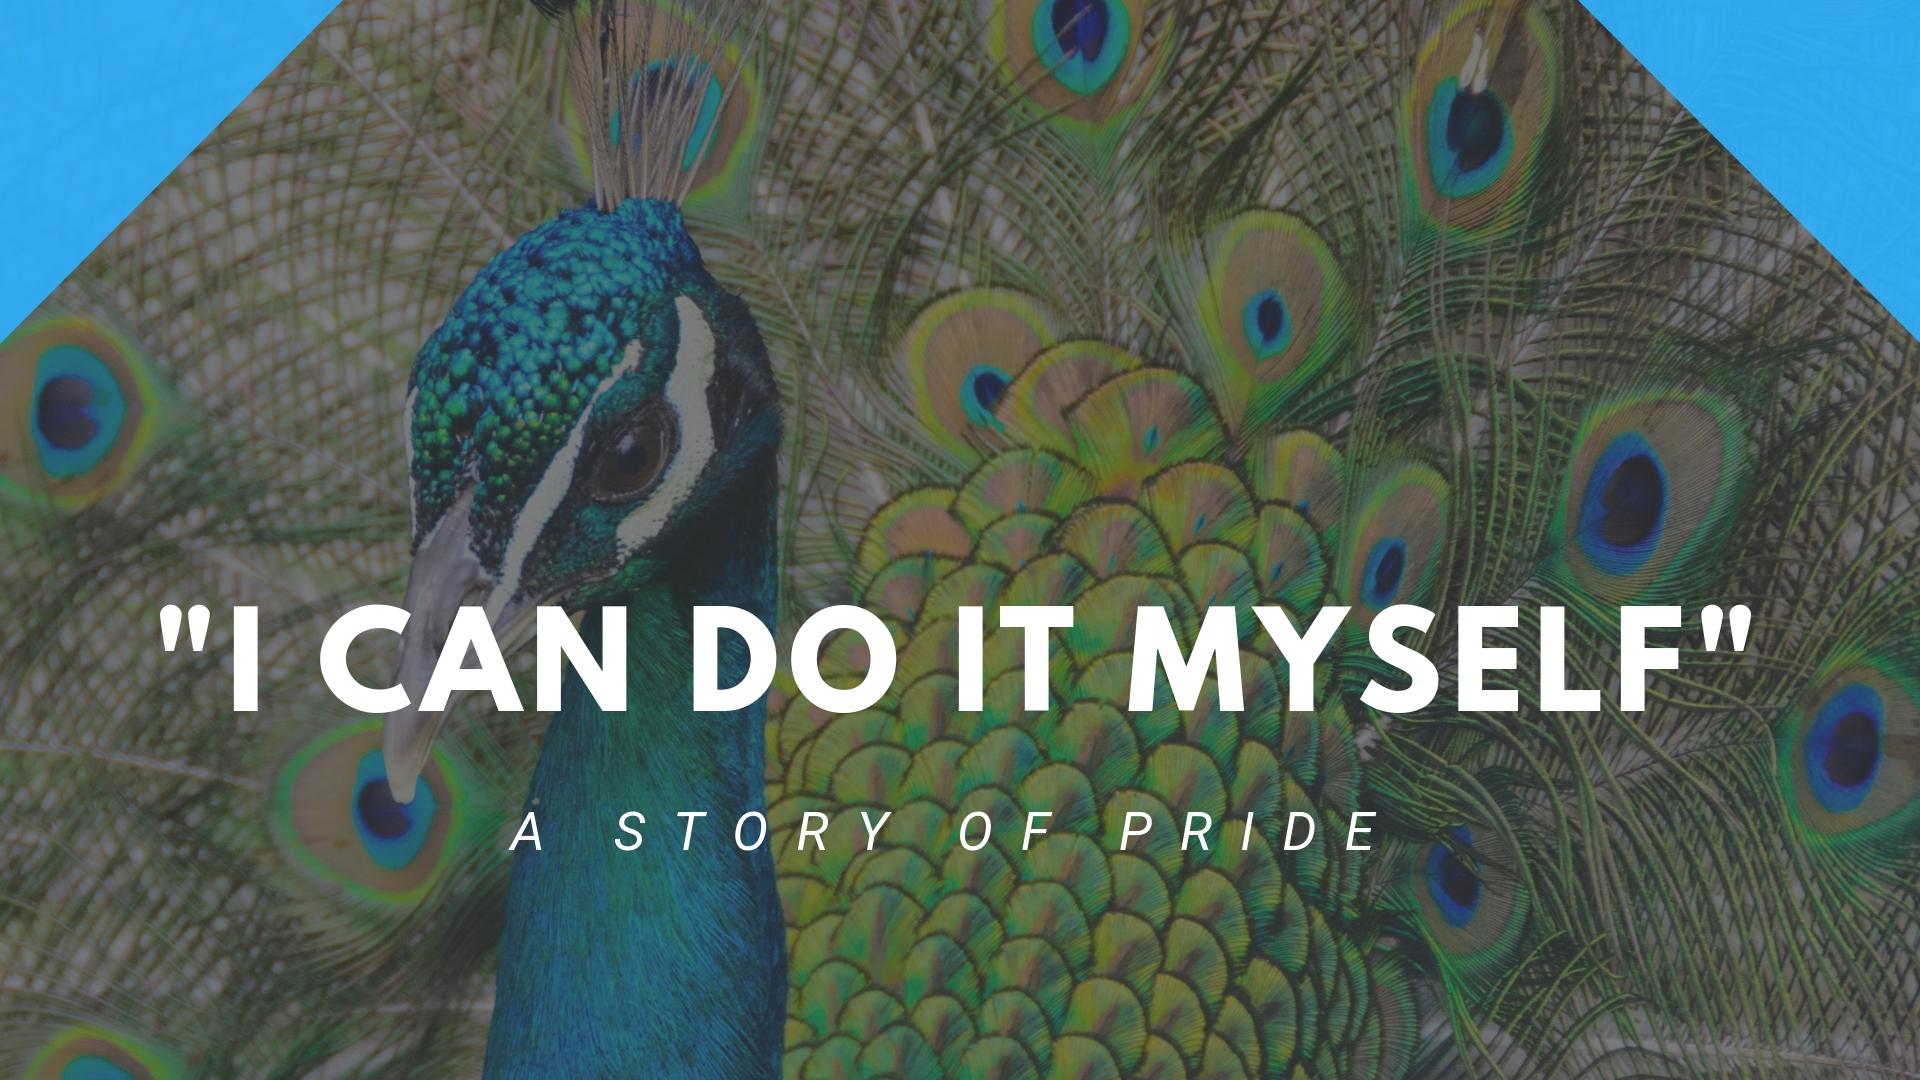 pride-I-can-do-it-myself.jpg